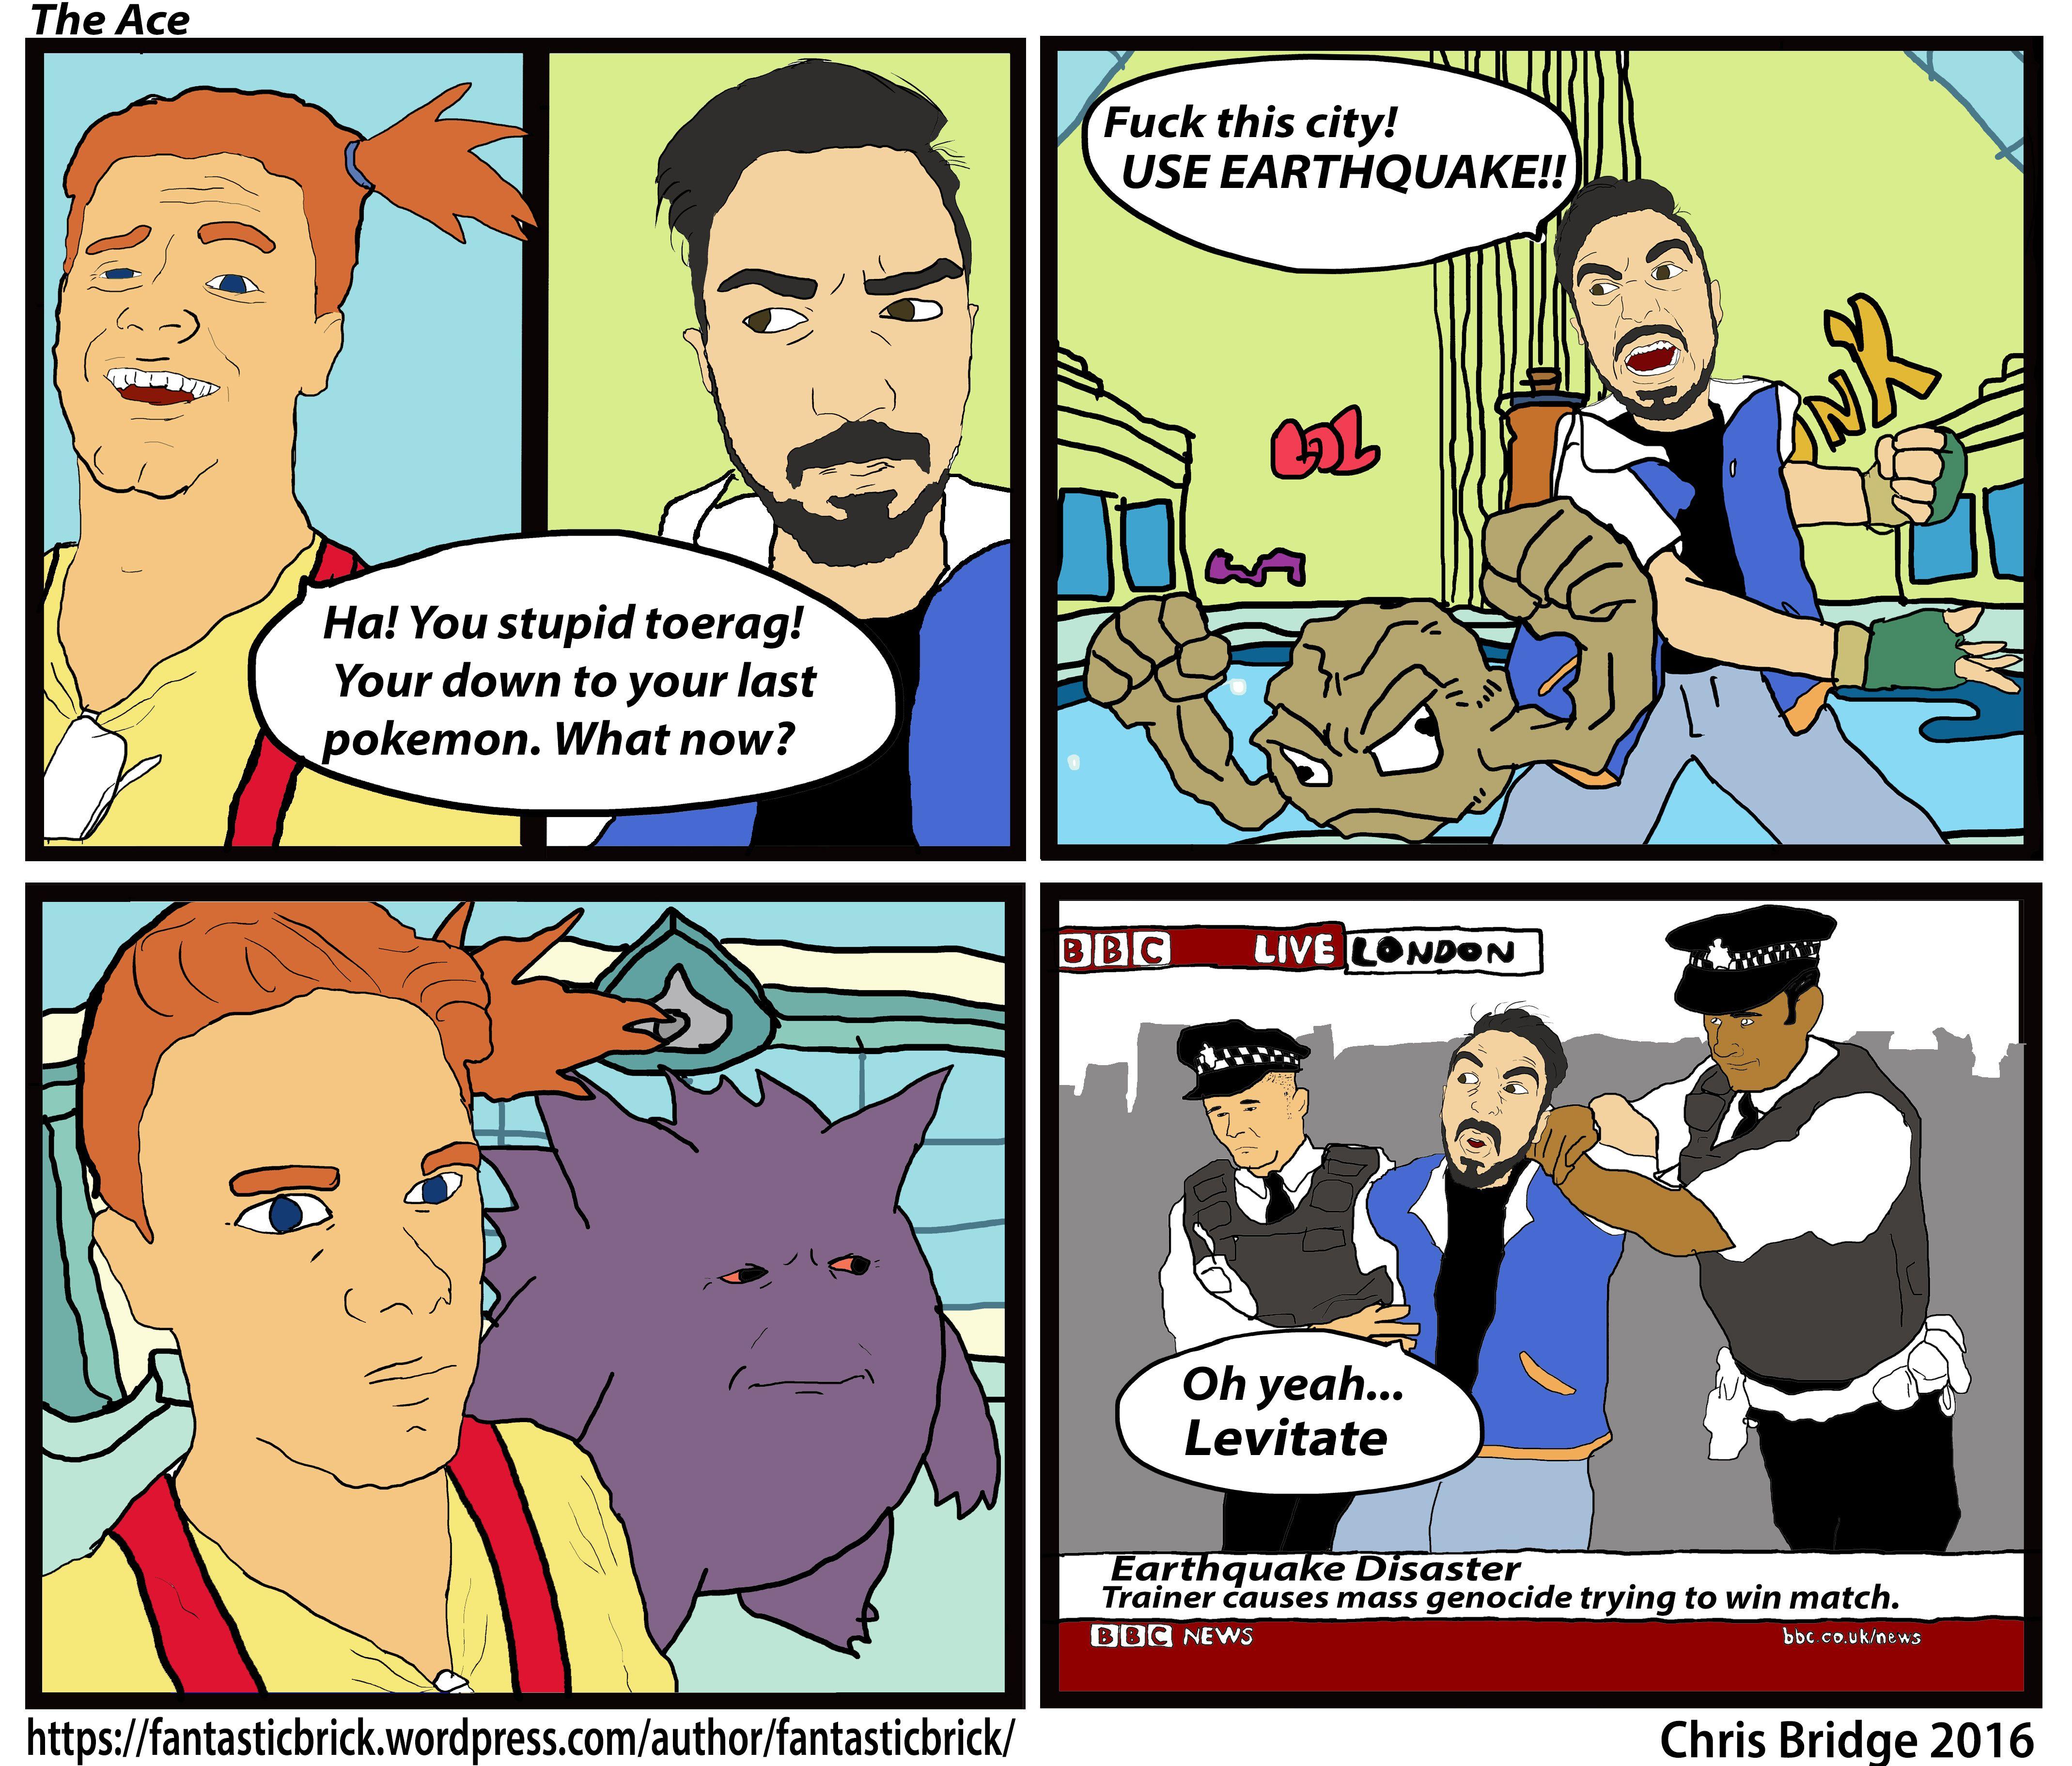 webcomic webcomics digitalart pokemon comics by fantasticbrick